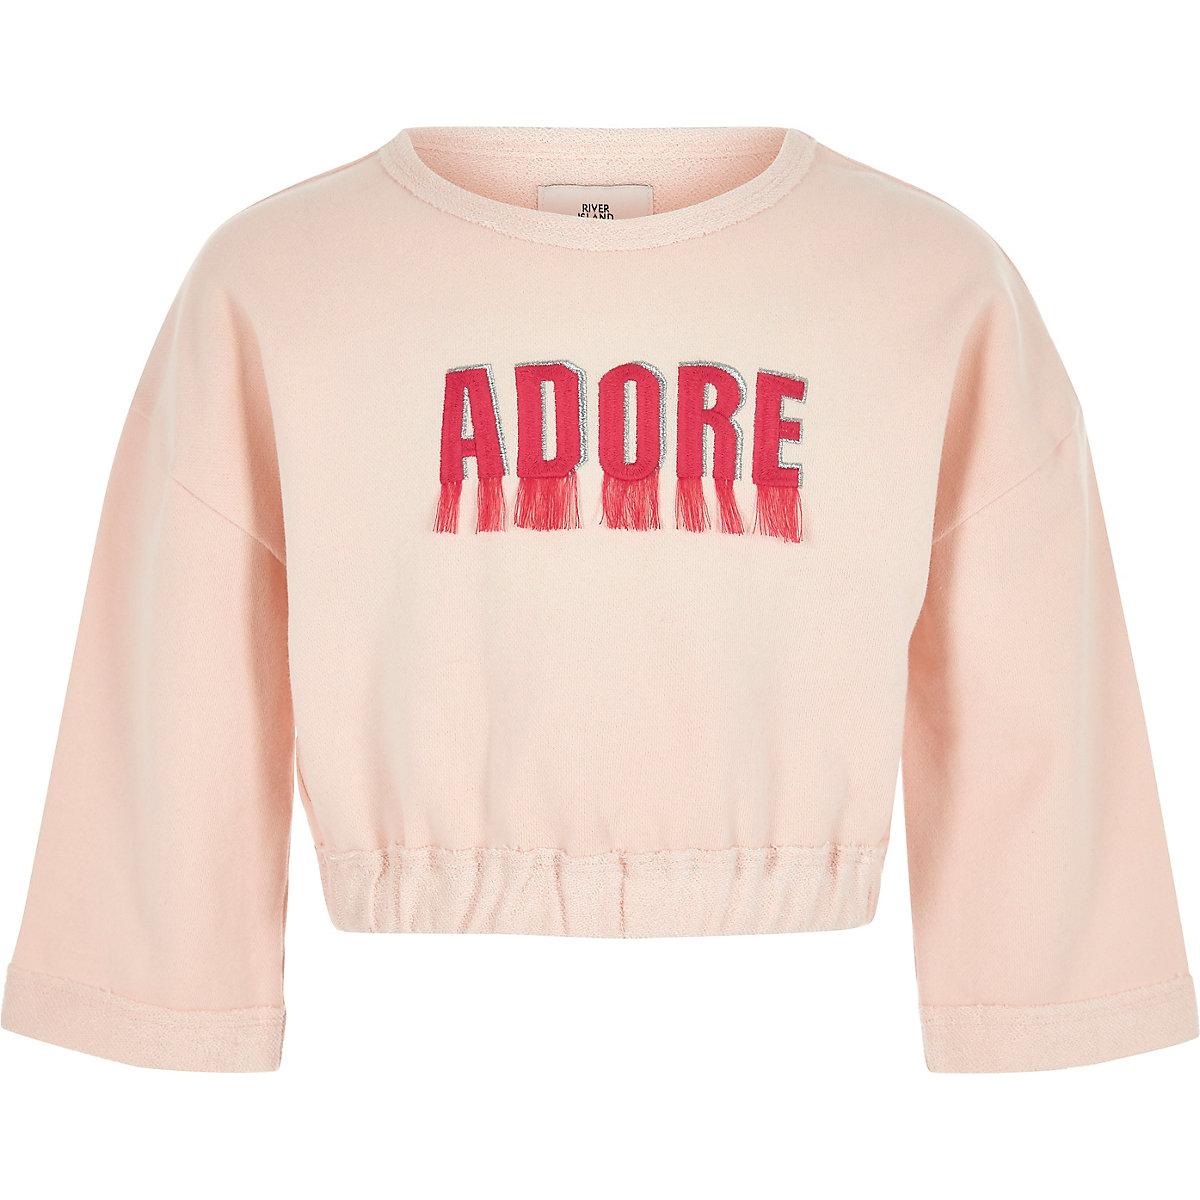 Girls pink 'adore' fringe sweatshirt